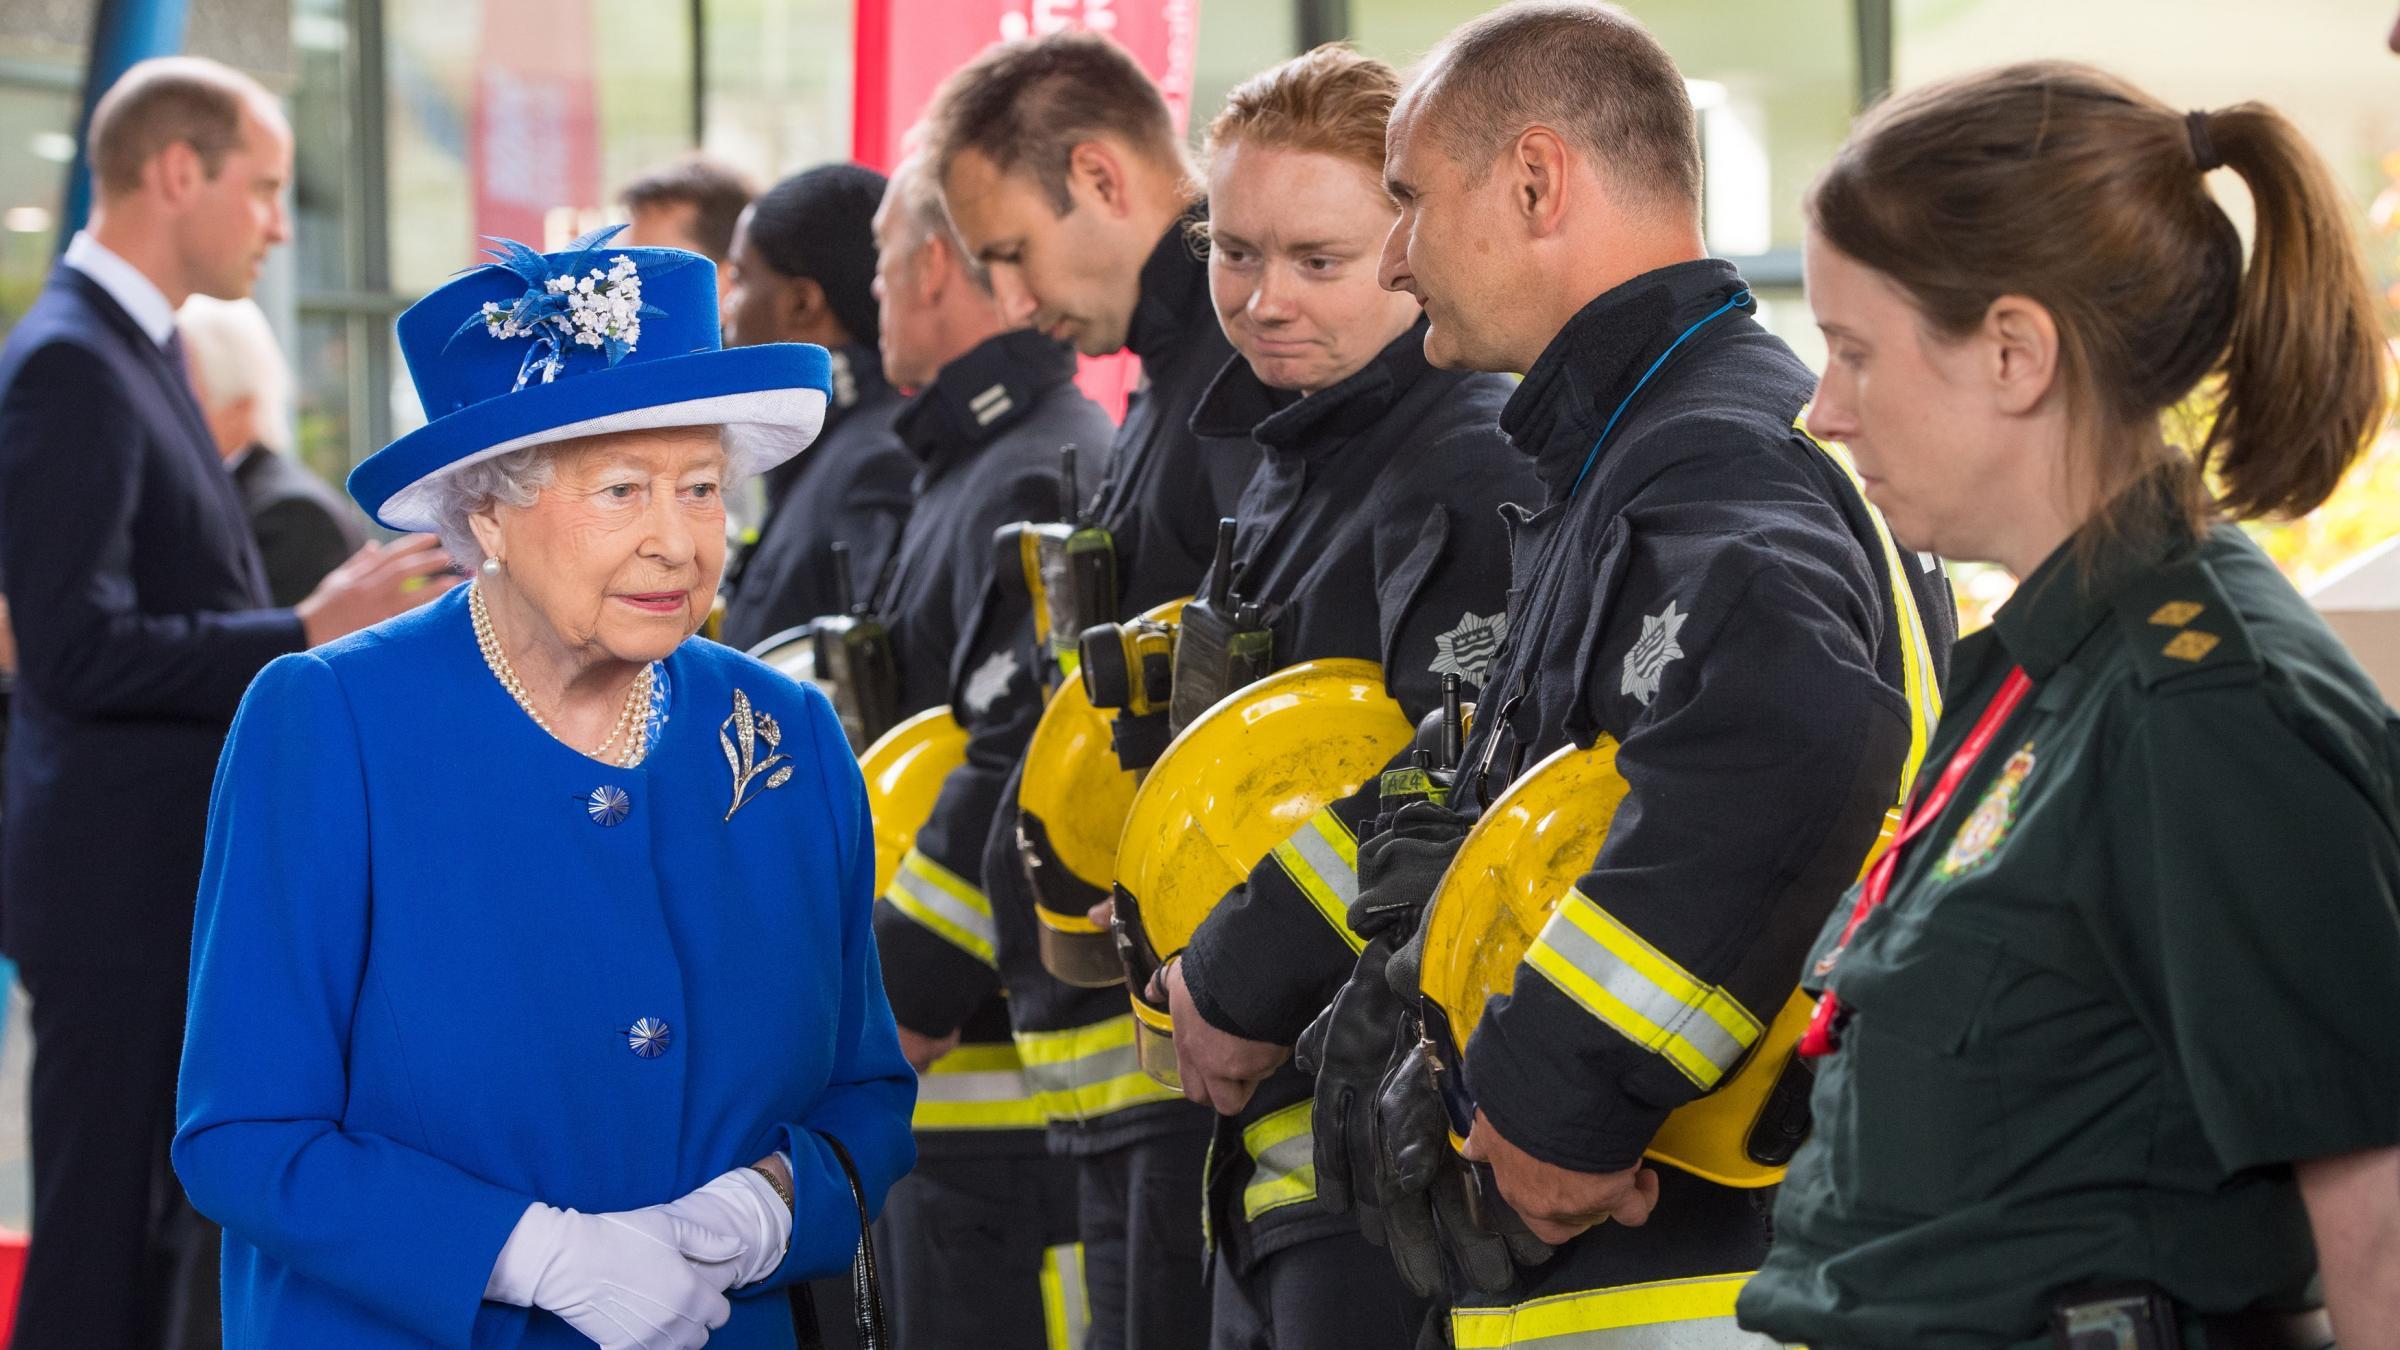 Queen says UK has been 'resolute in face of adversity'